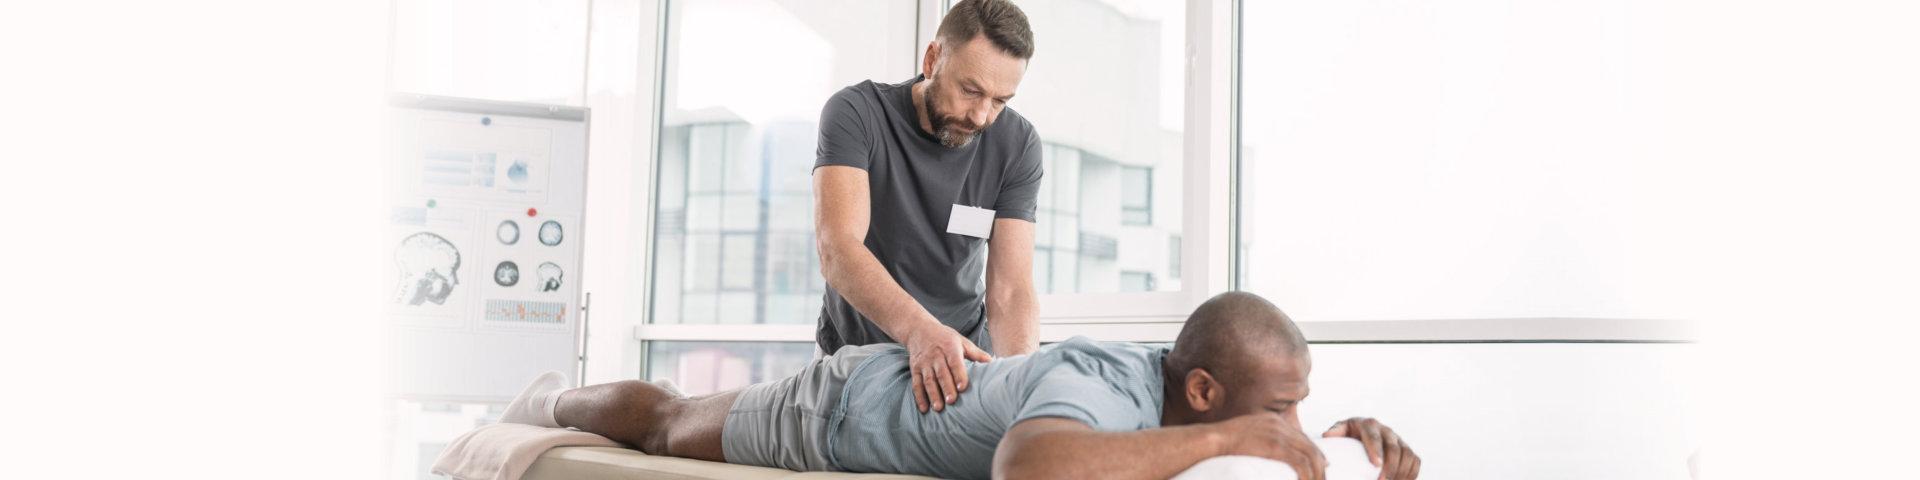 therapists massagin the man